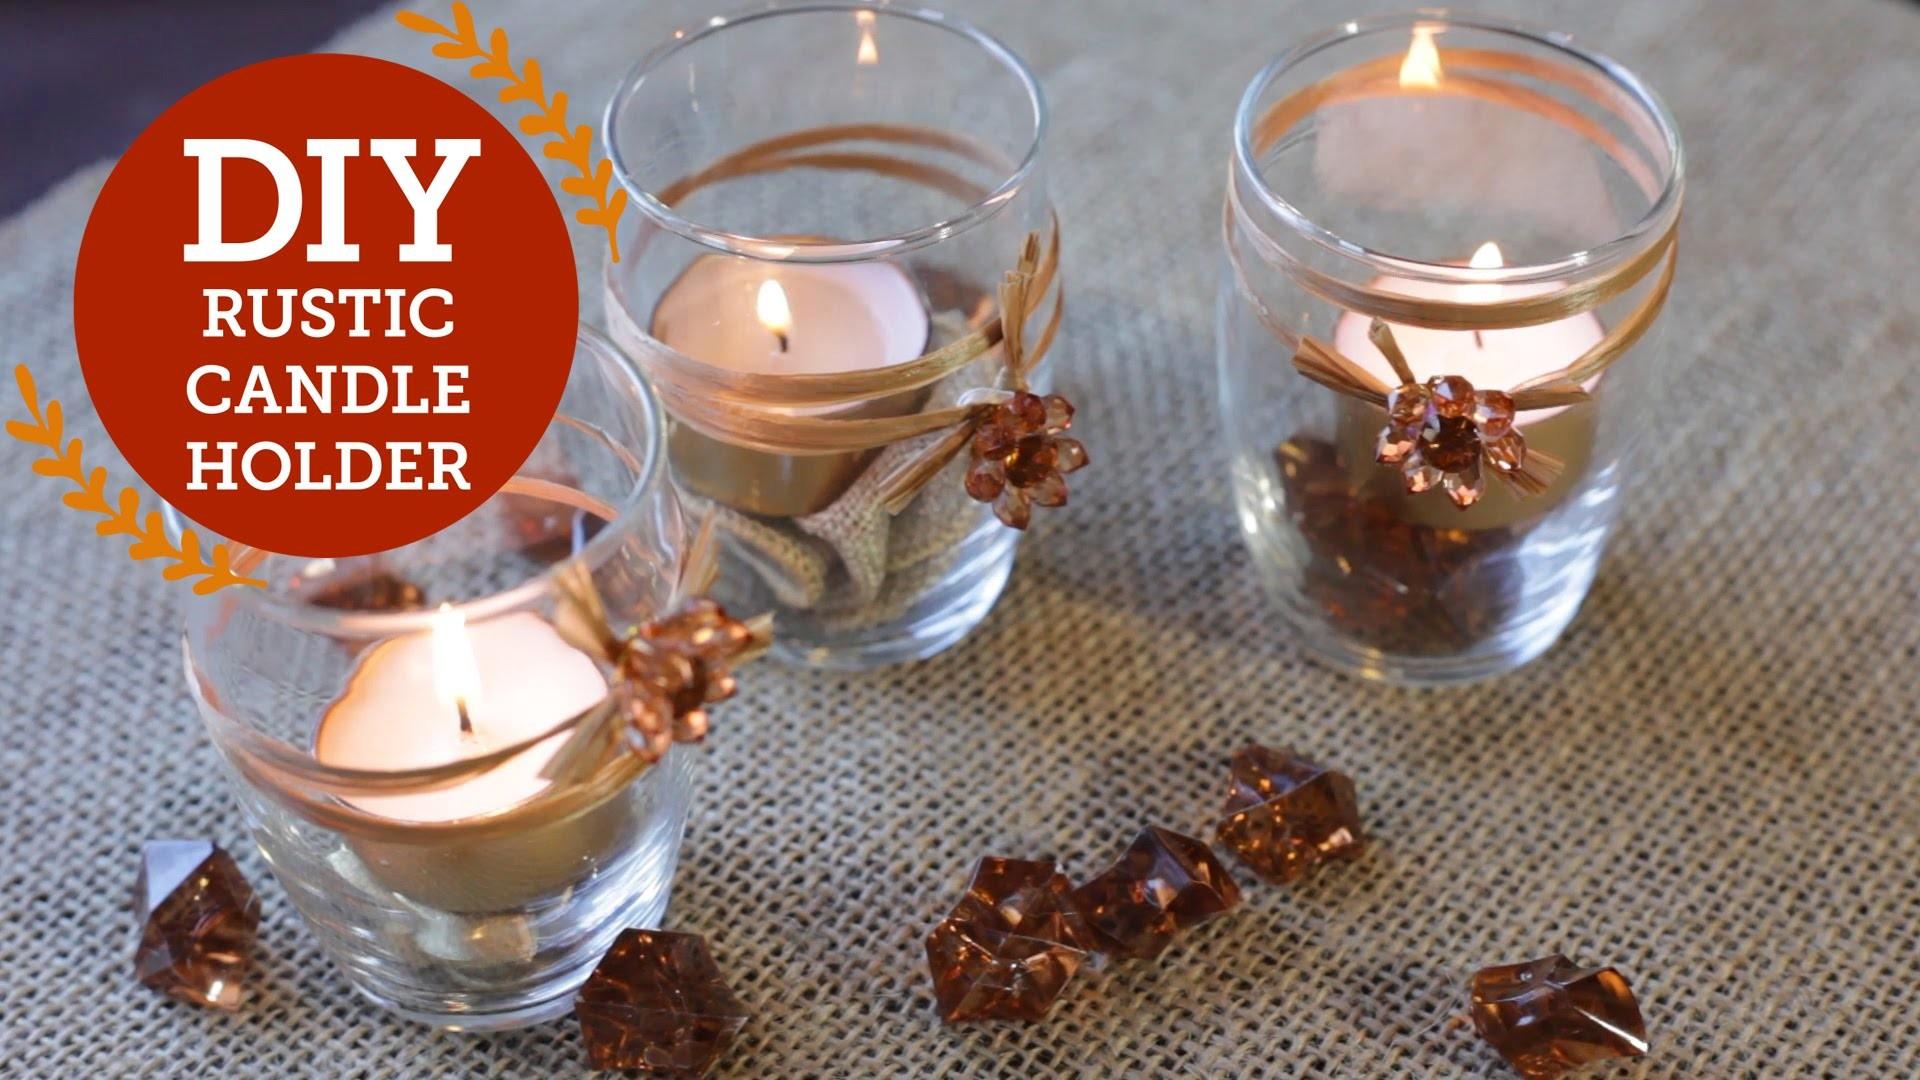 Rustic Candle Holder DIY Decorations   BalsaCircle.com